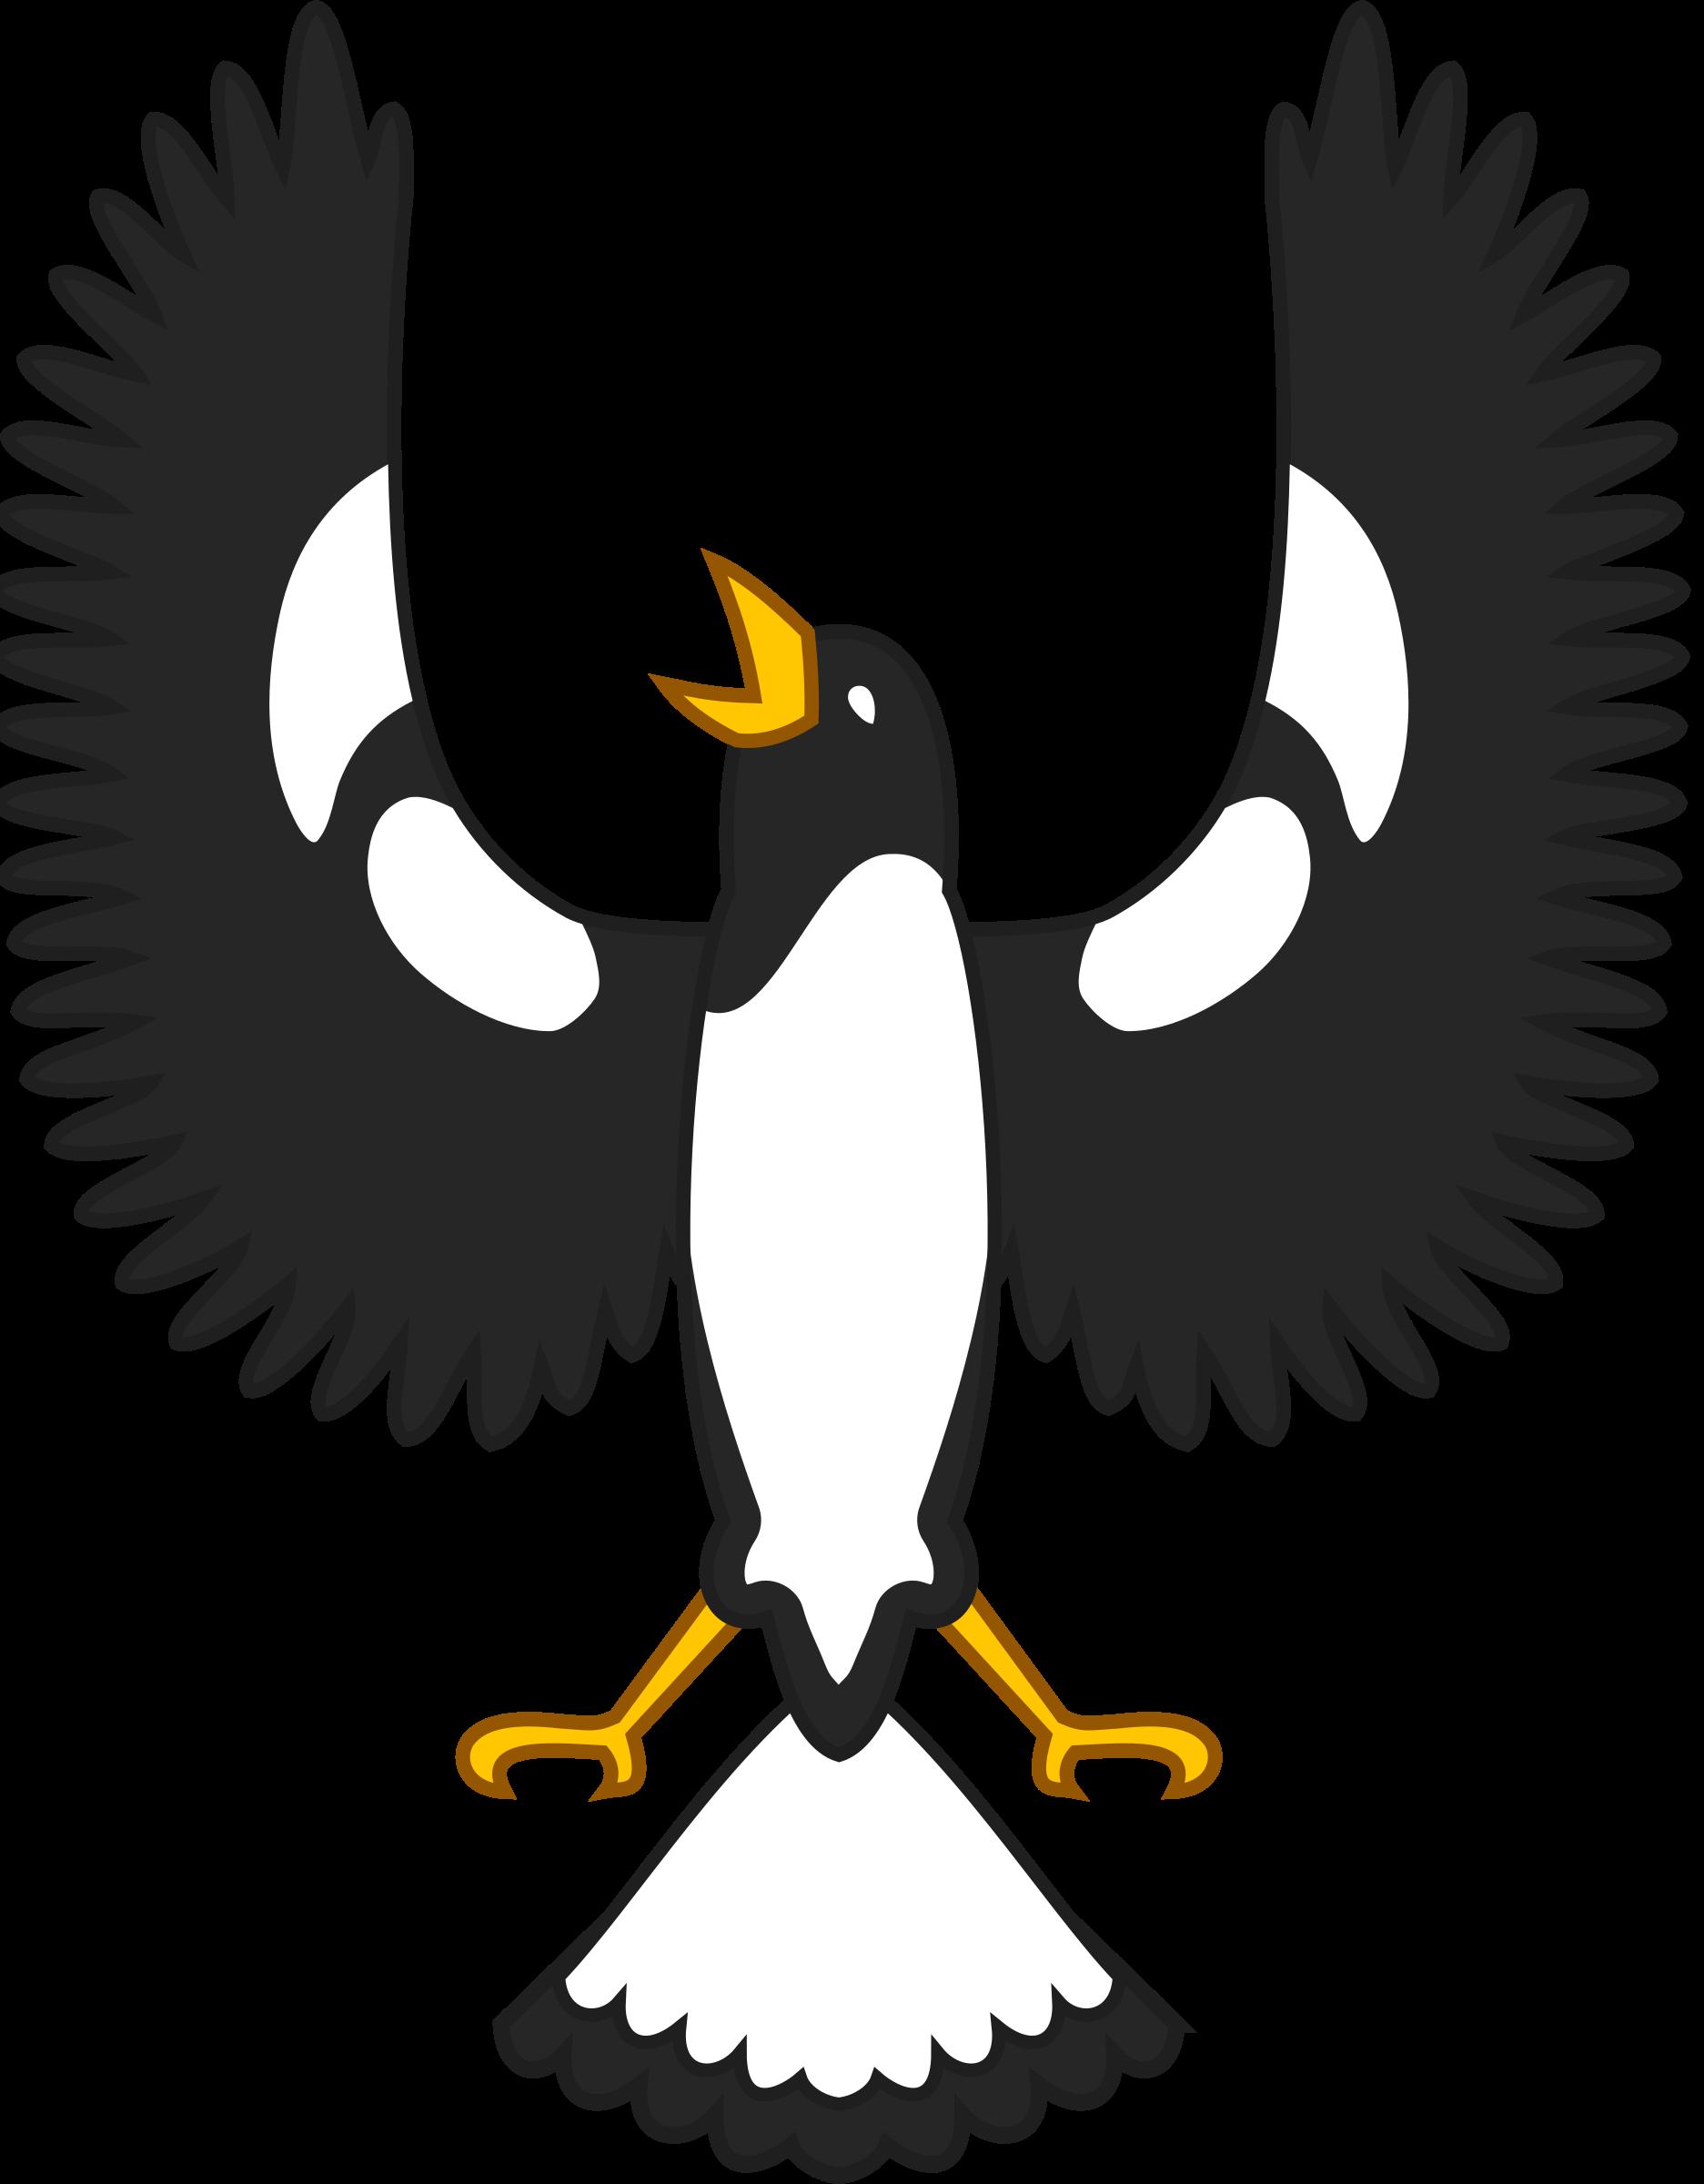 Shrike clipart #15, Download drawings